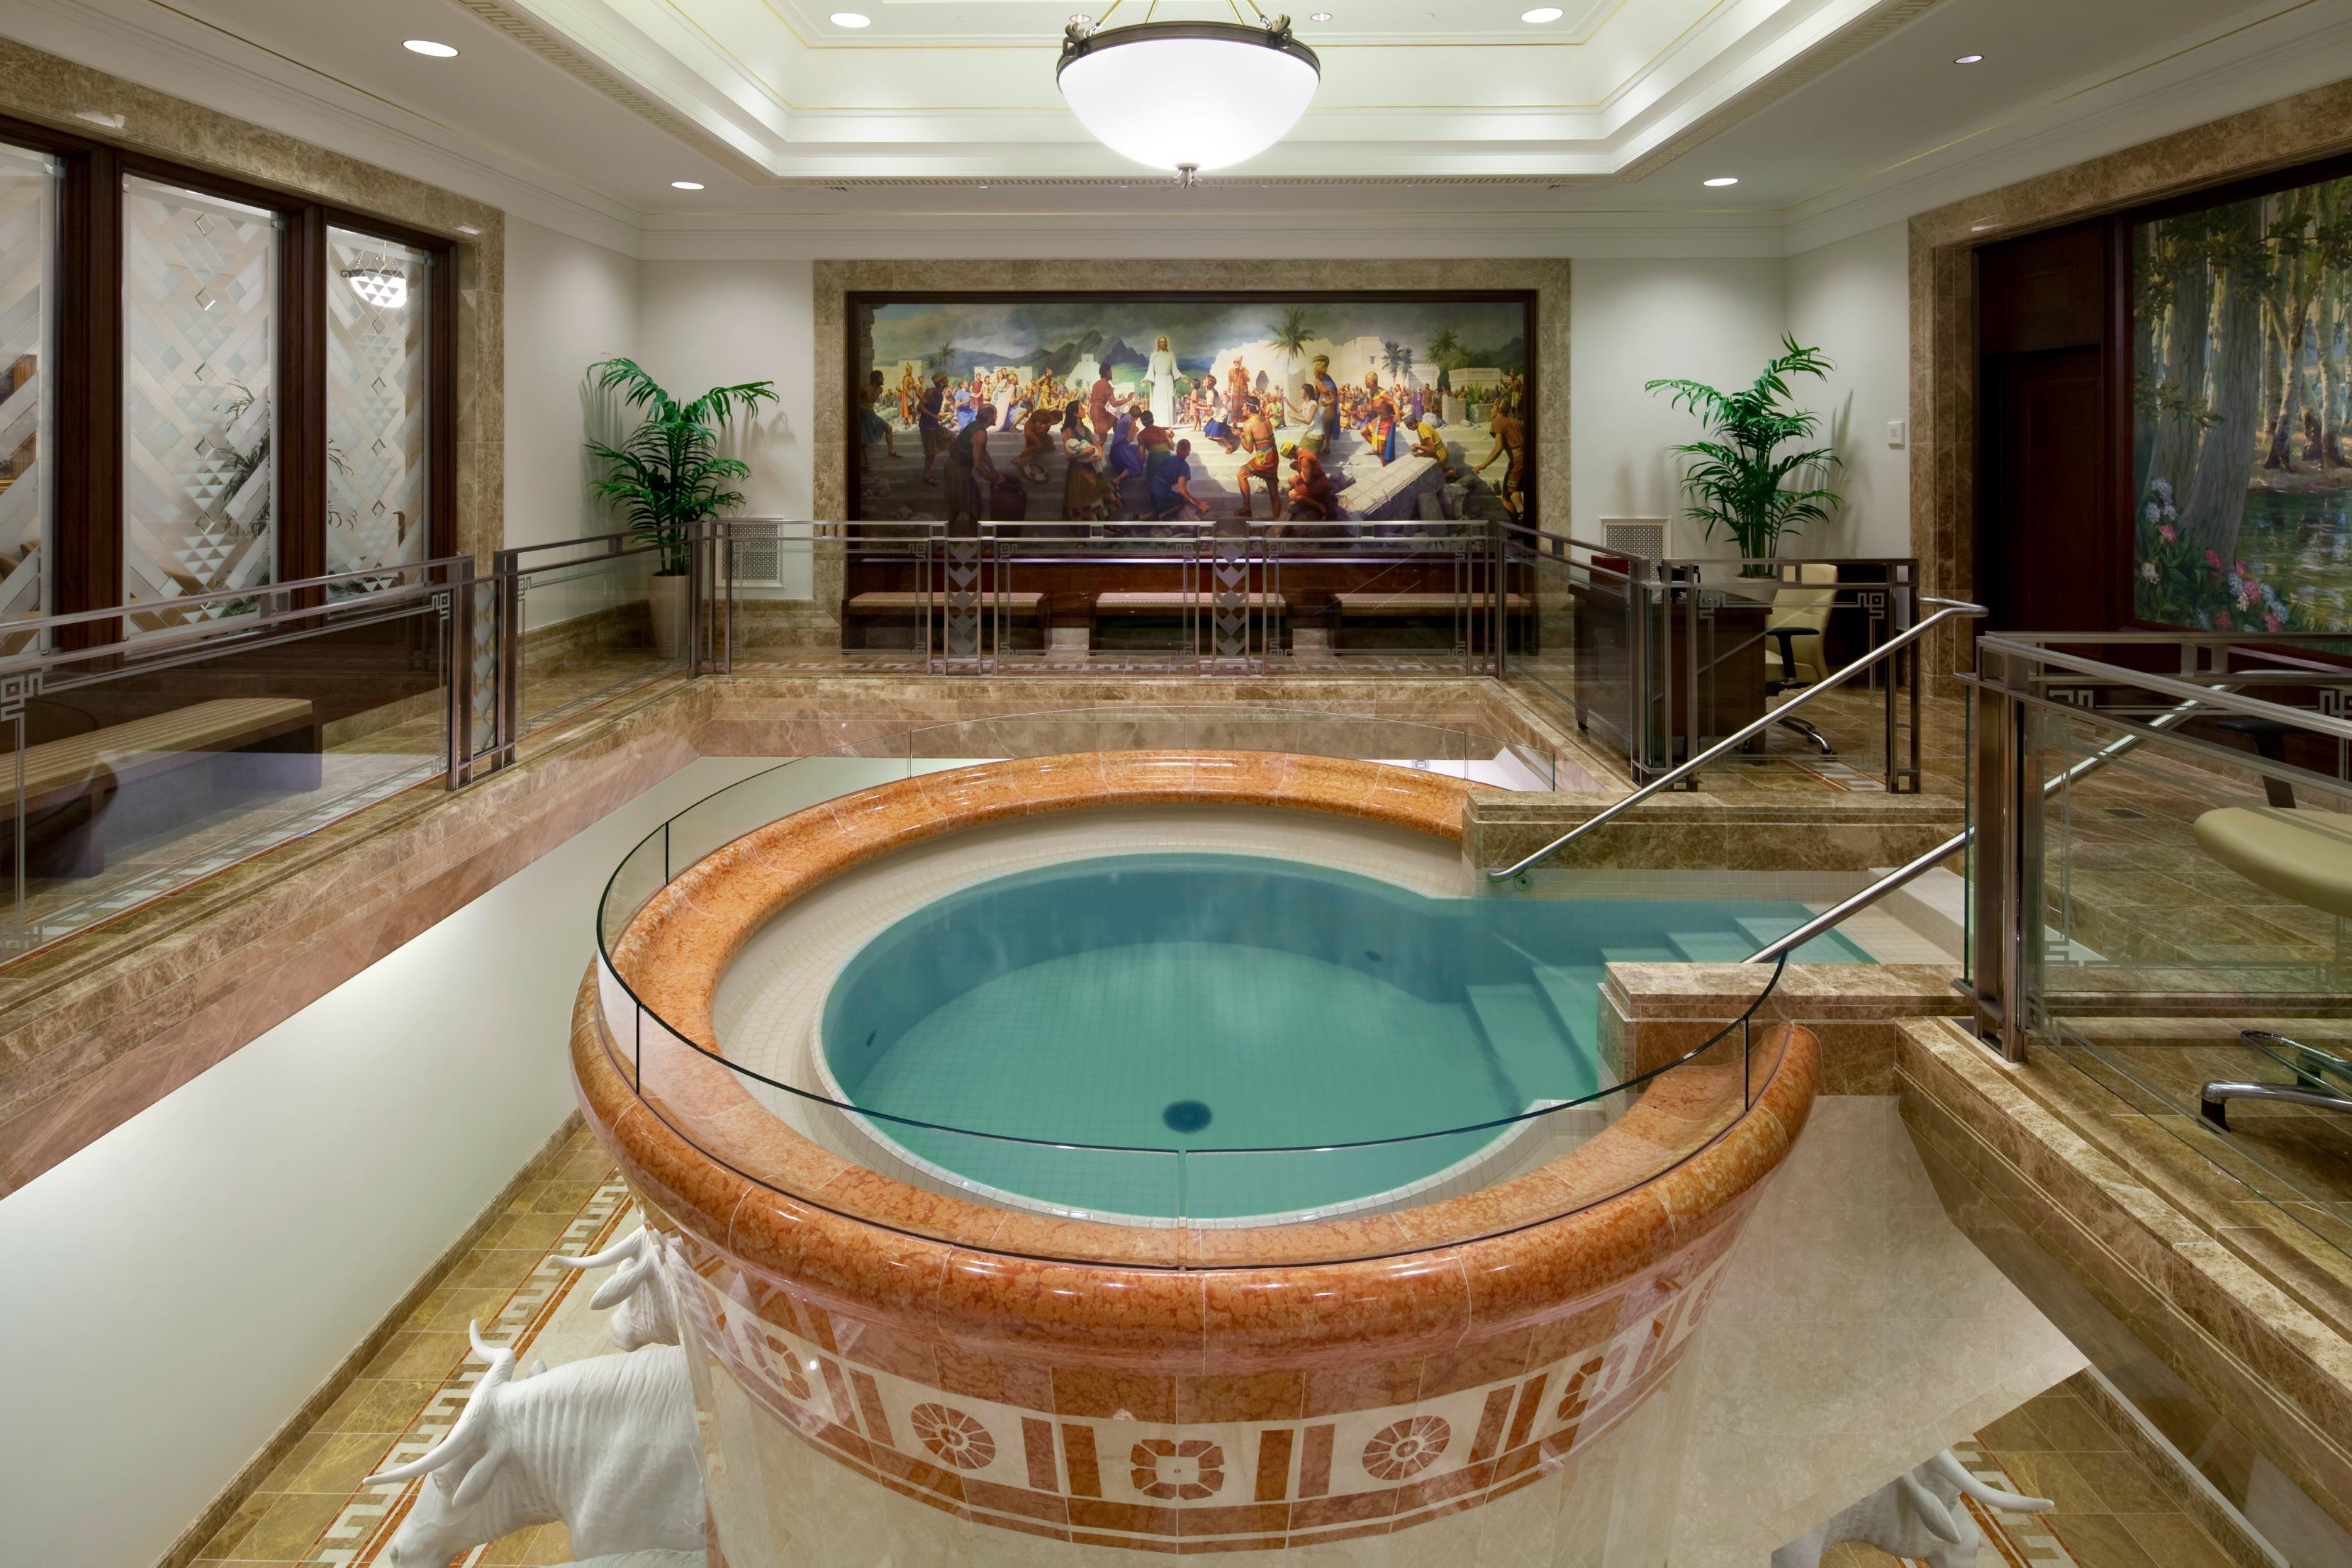 Mormon Temple baptismal font